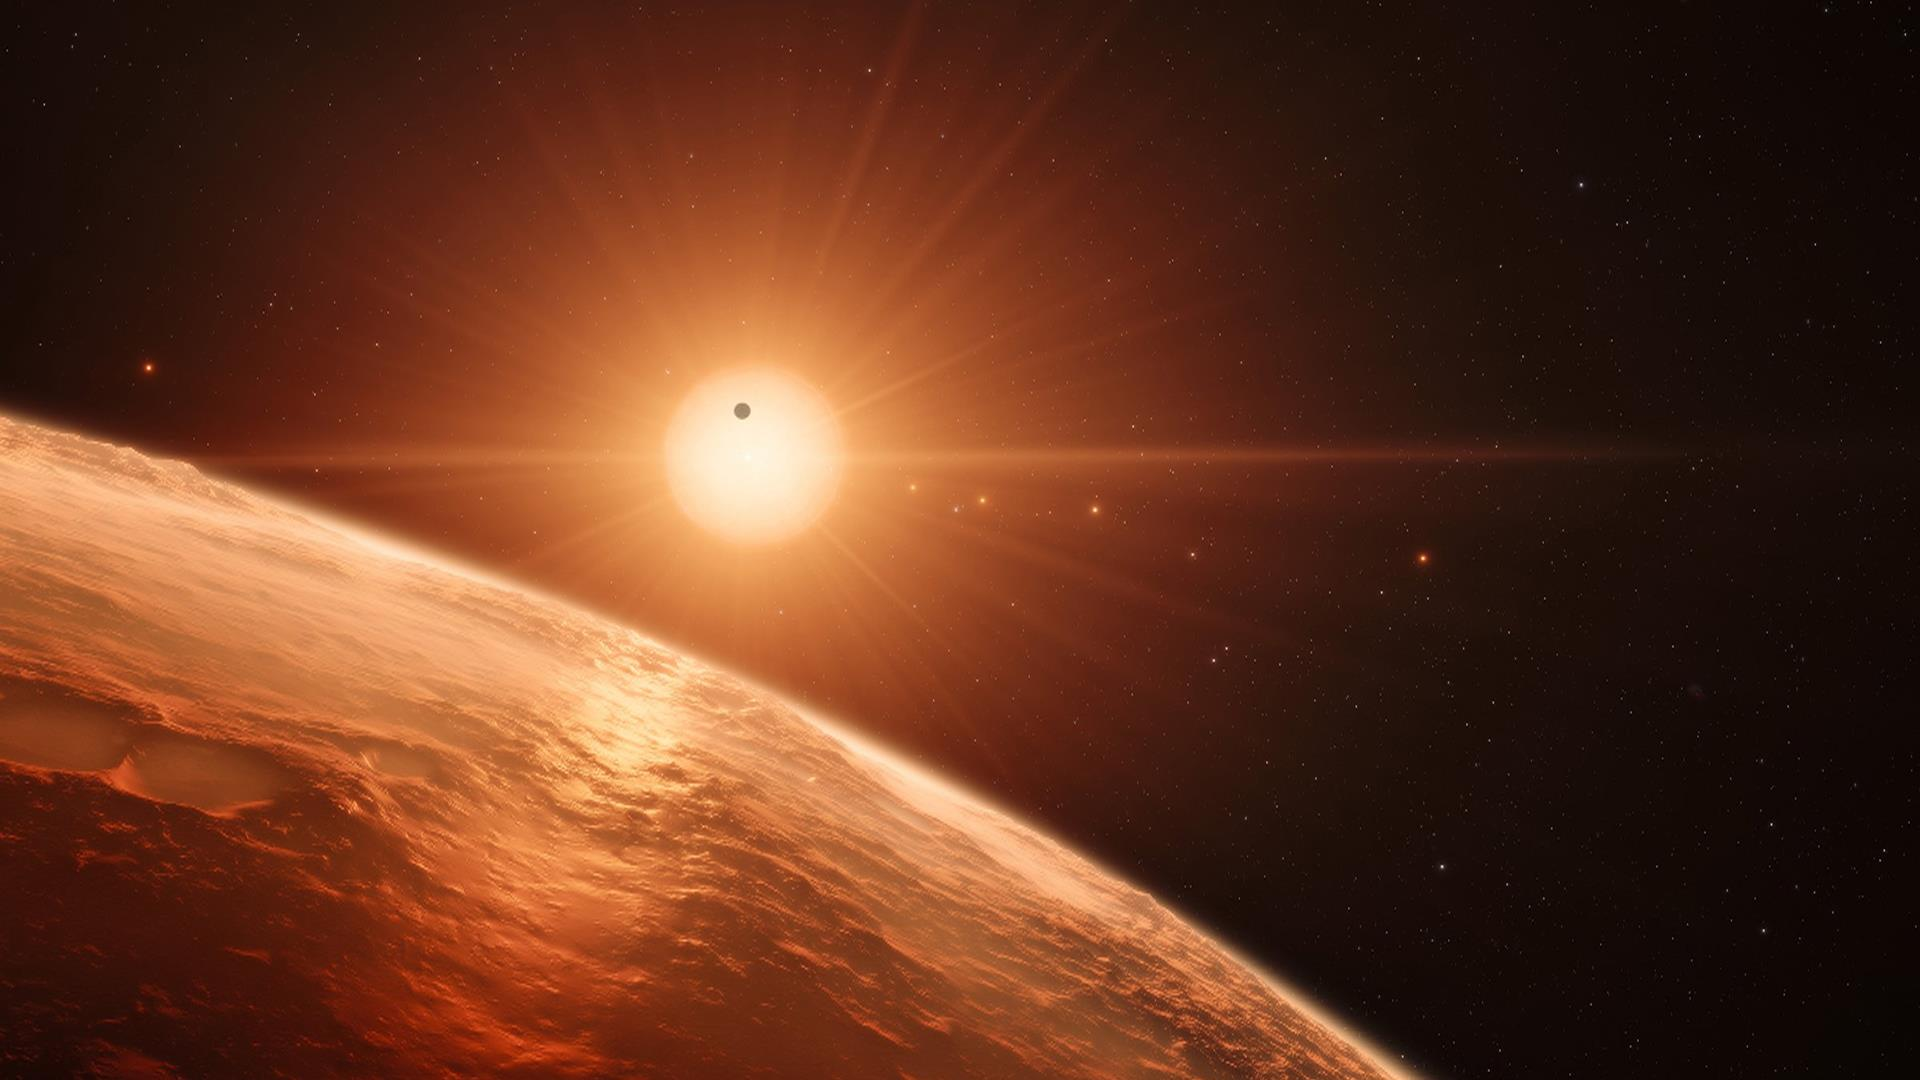 solar system nasa planets - photo #25